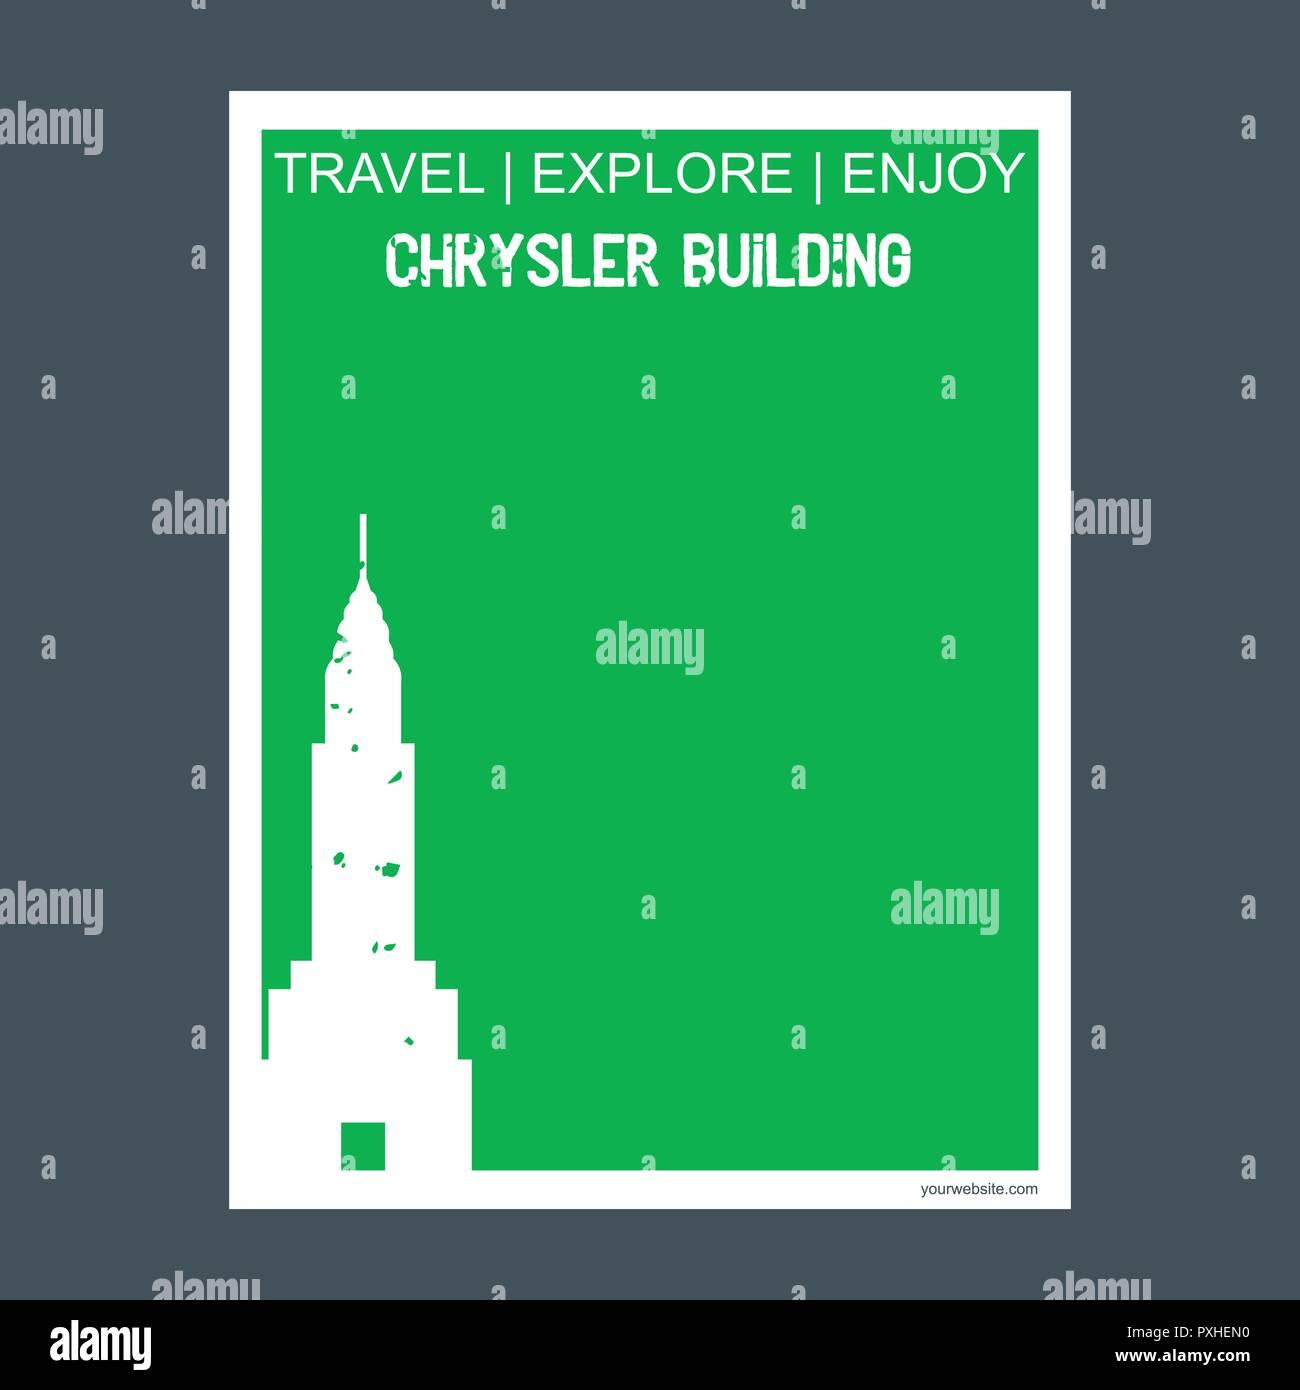 Chrysler Building Manhattan, New York monument landmark brochure Flat style and typography vector - Stock Vector